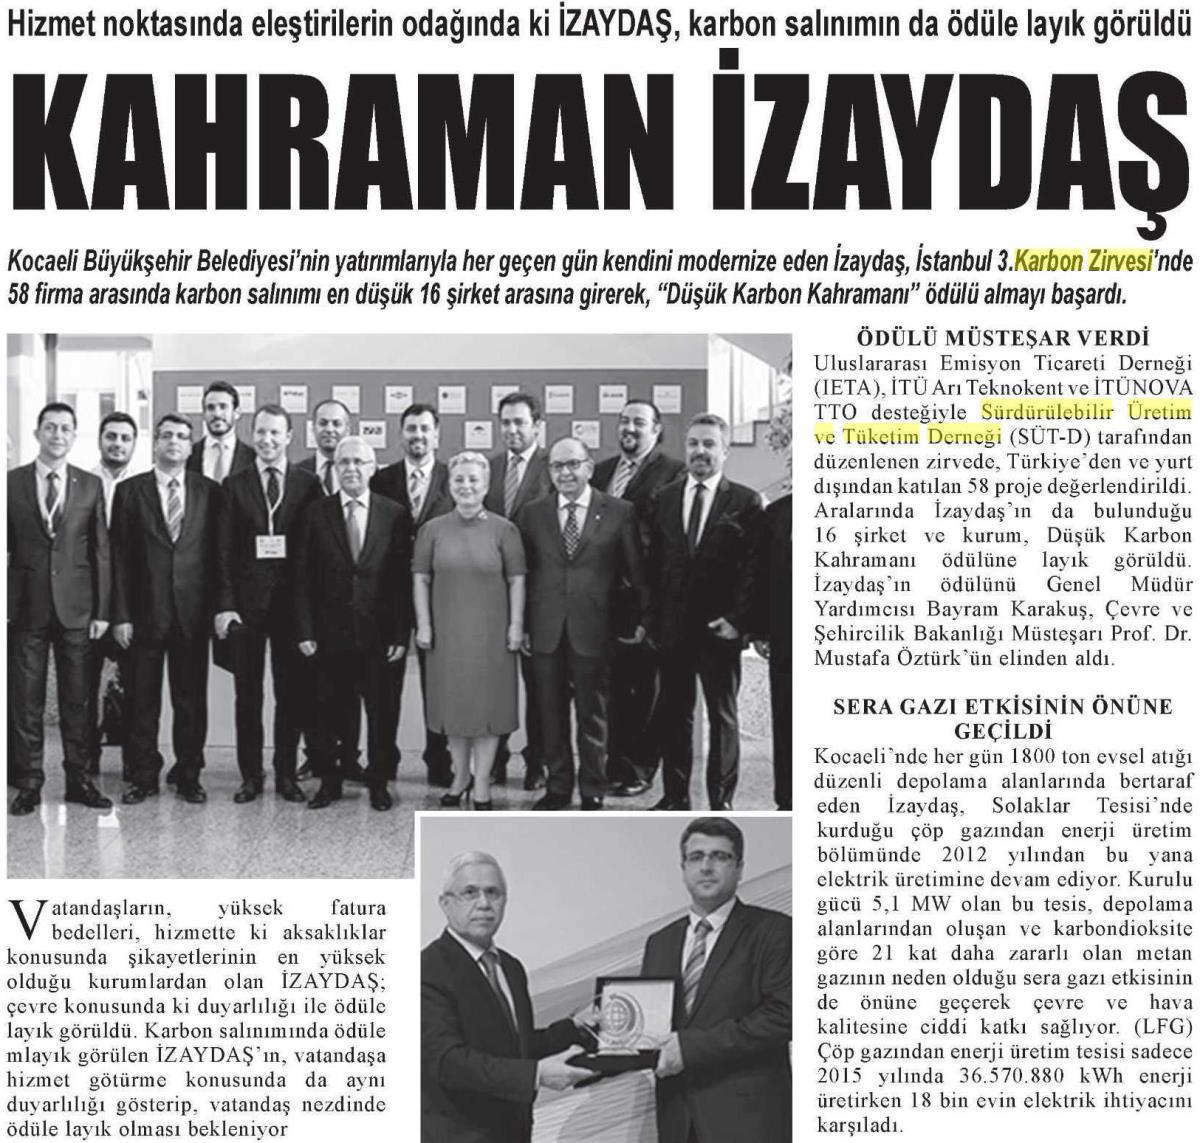 Nefes Gazetesi Gebze 30.04.2016